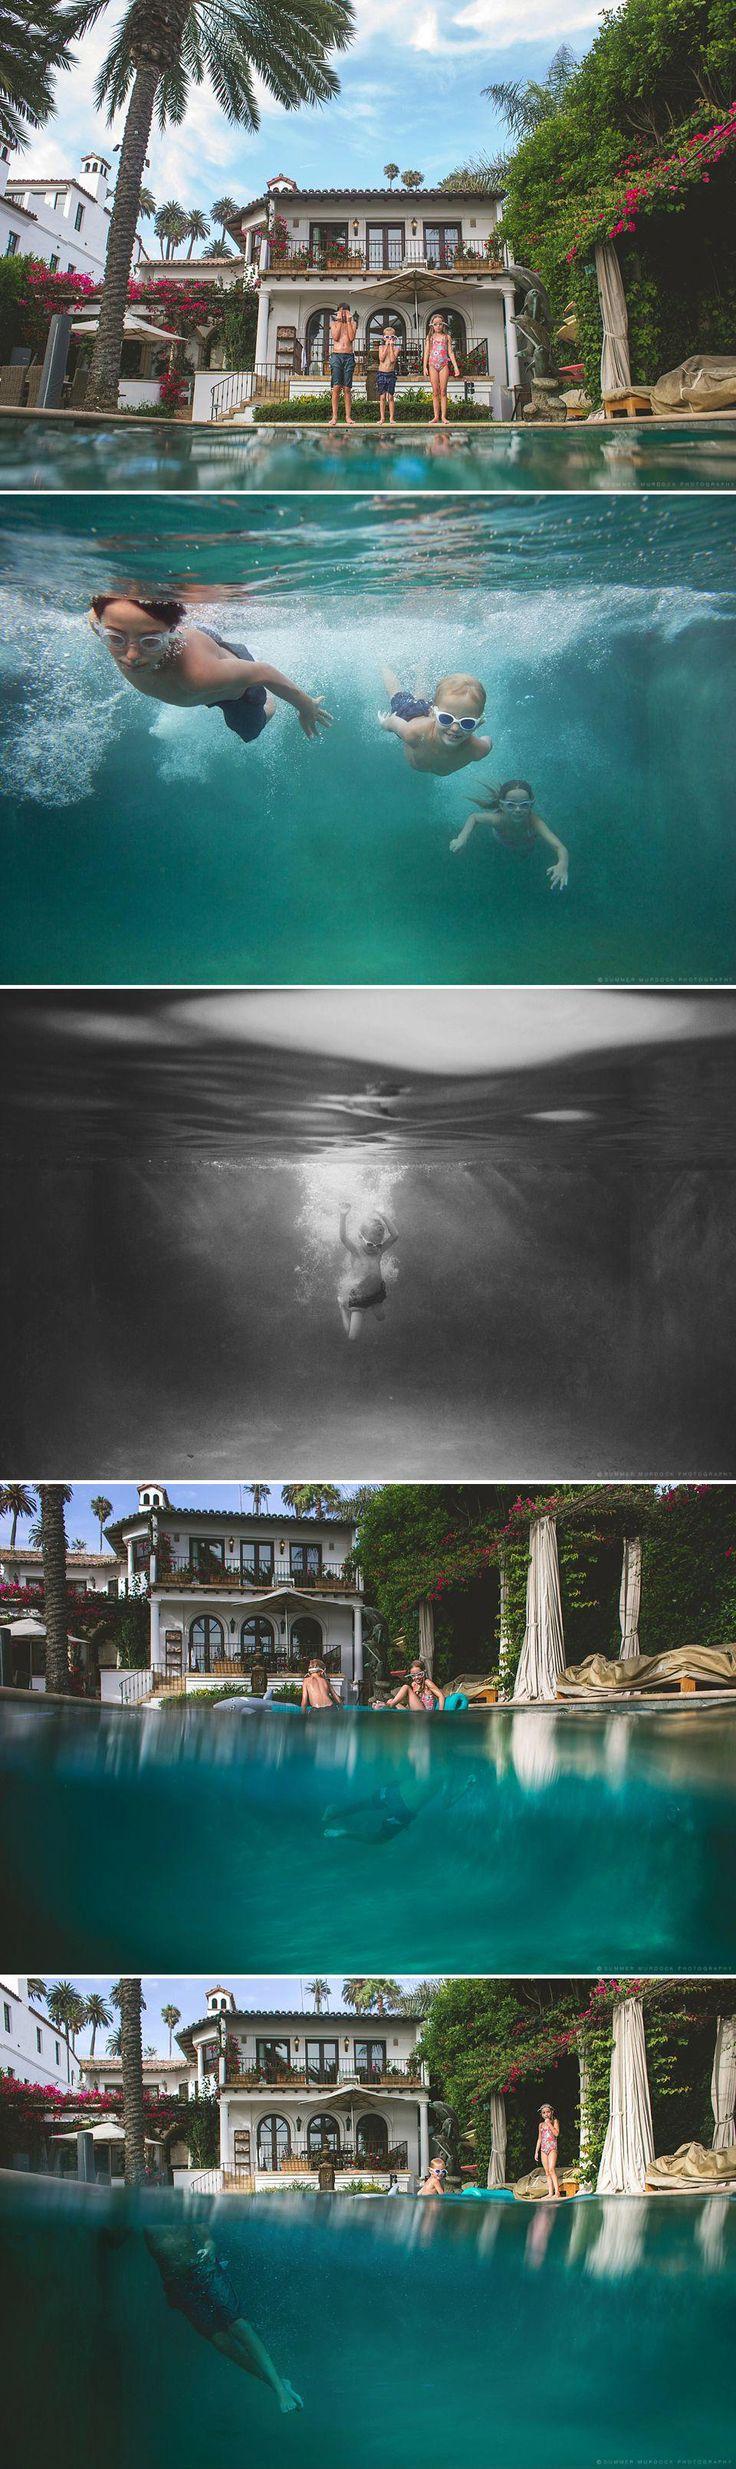 Summer Murdock Photography Salt Lake City Photographer Underwater Photography...